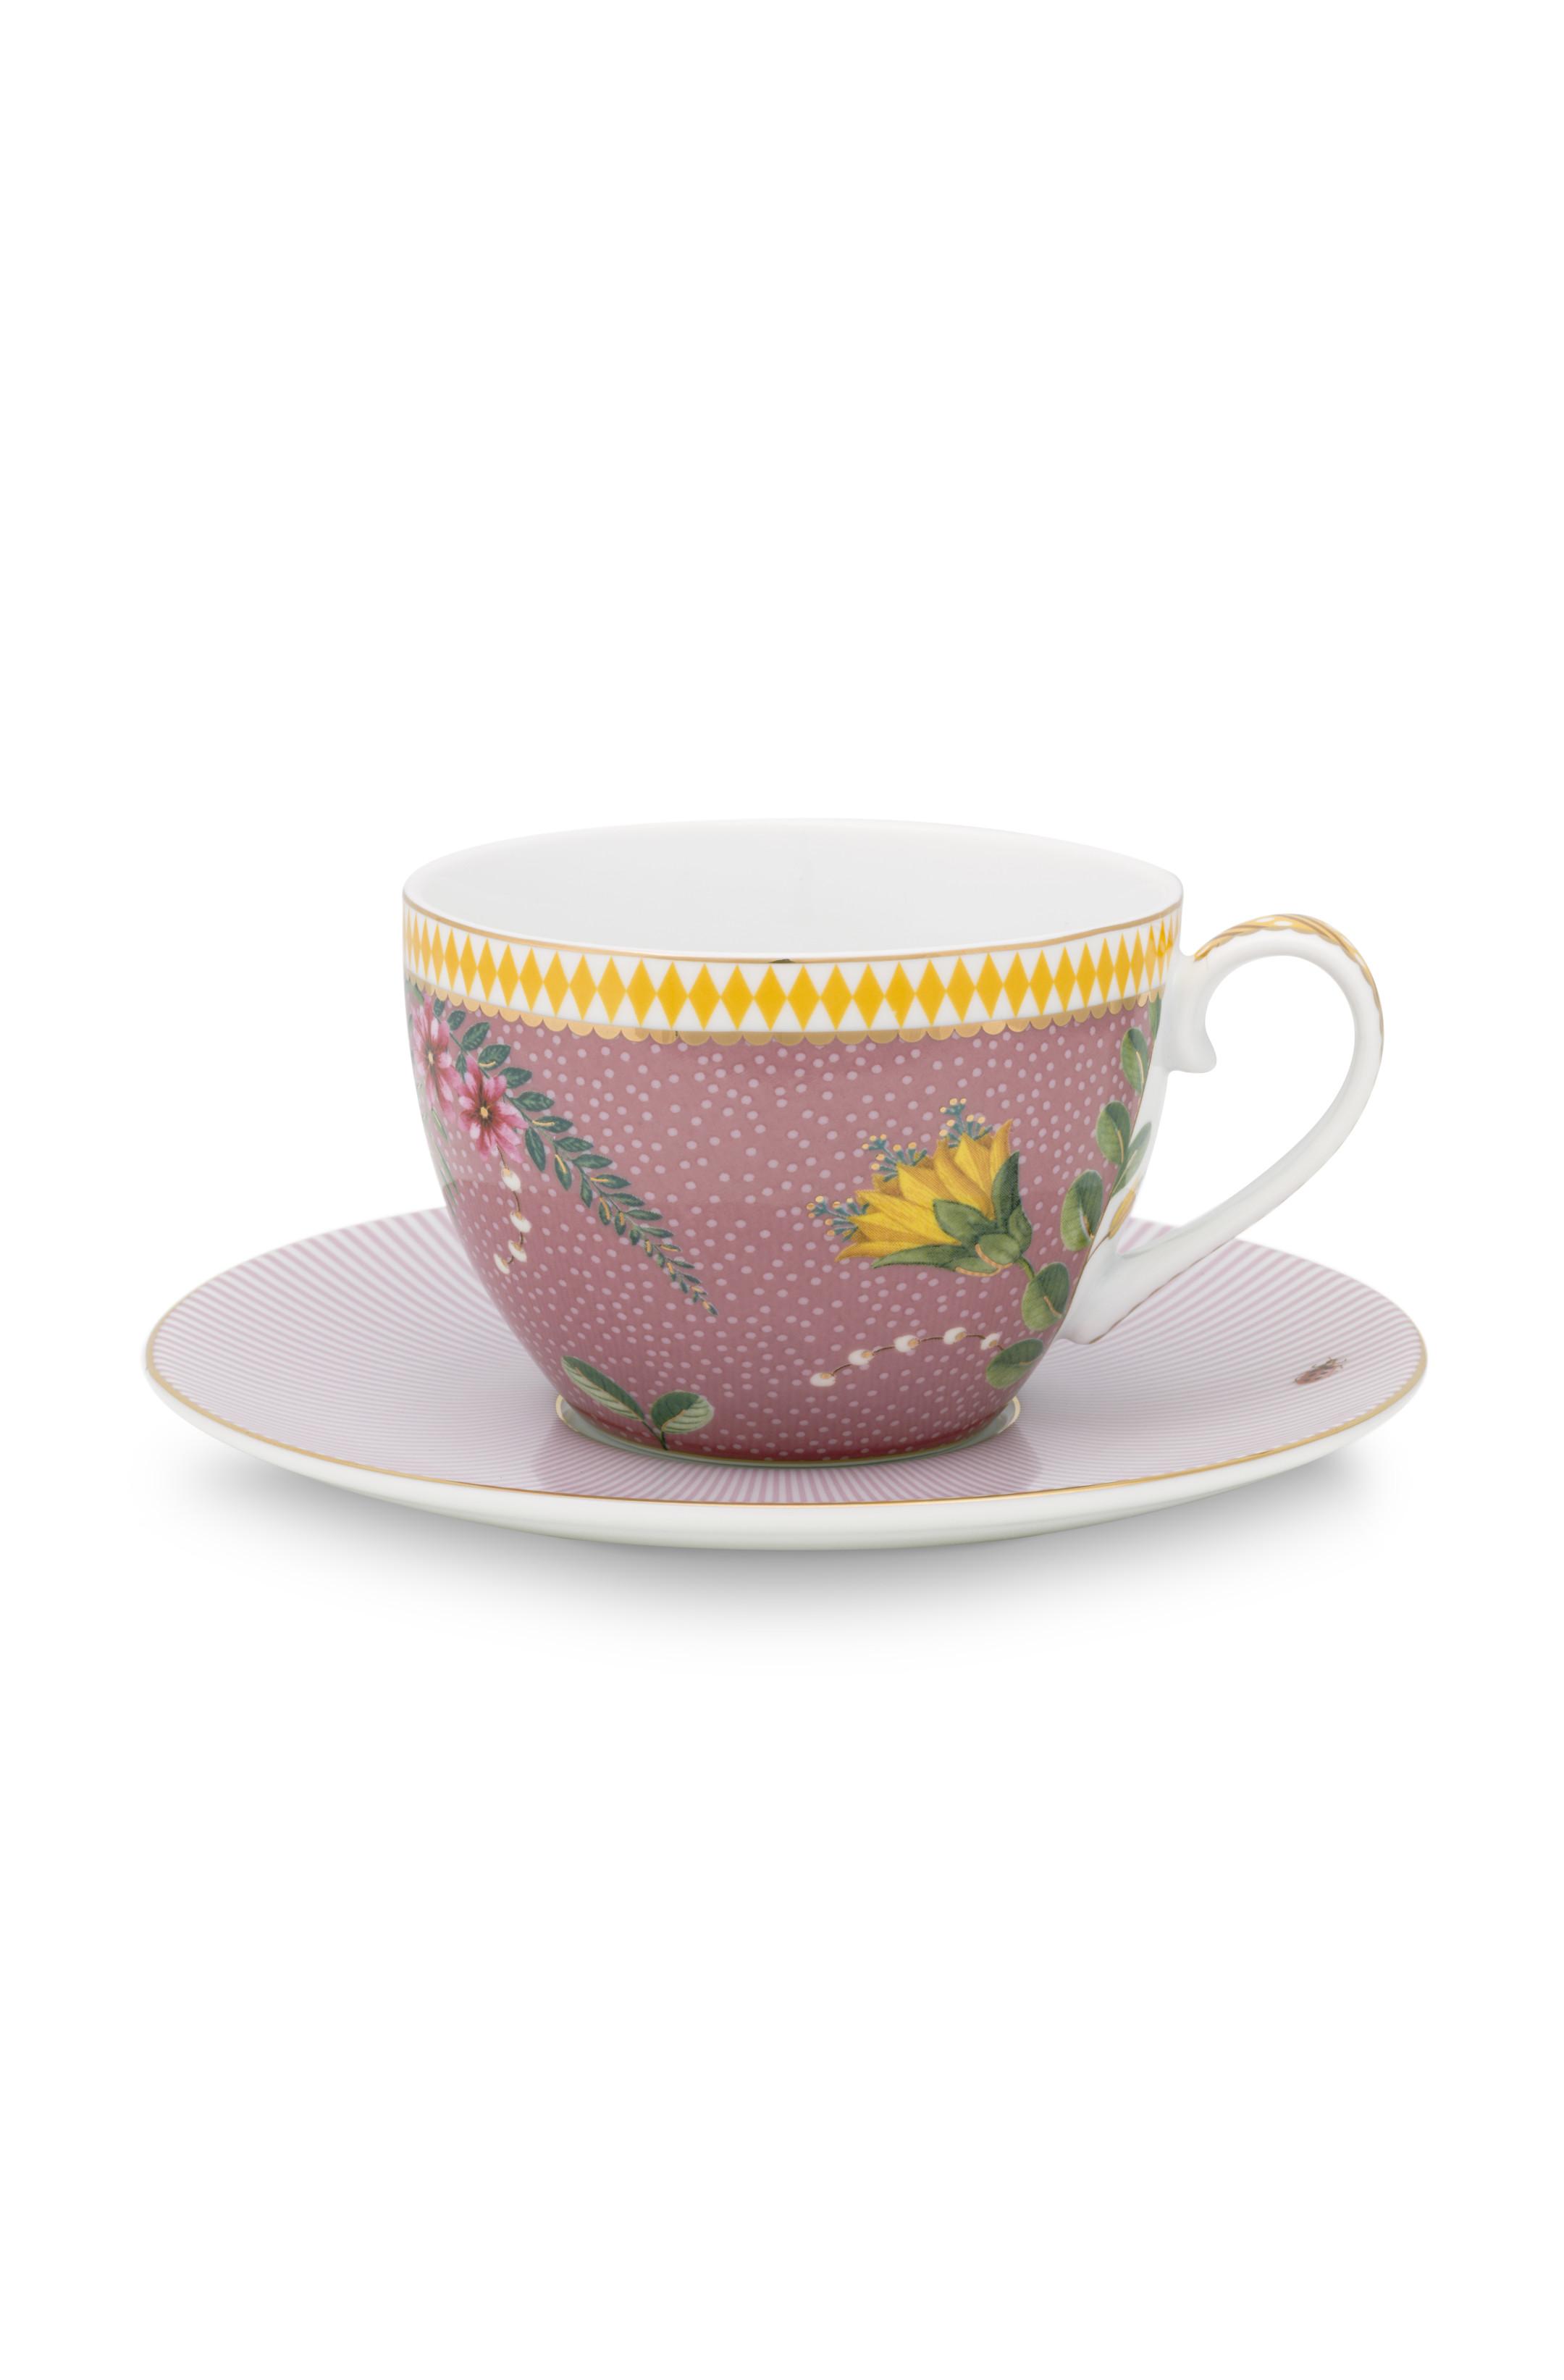 Pip Studio La Majorelle Tasse & Untertasse Pink